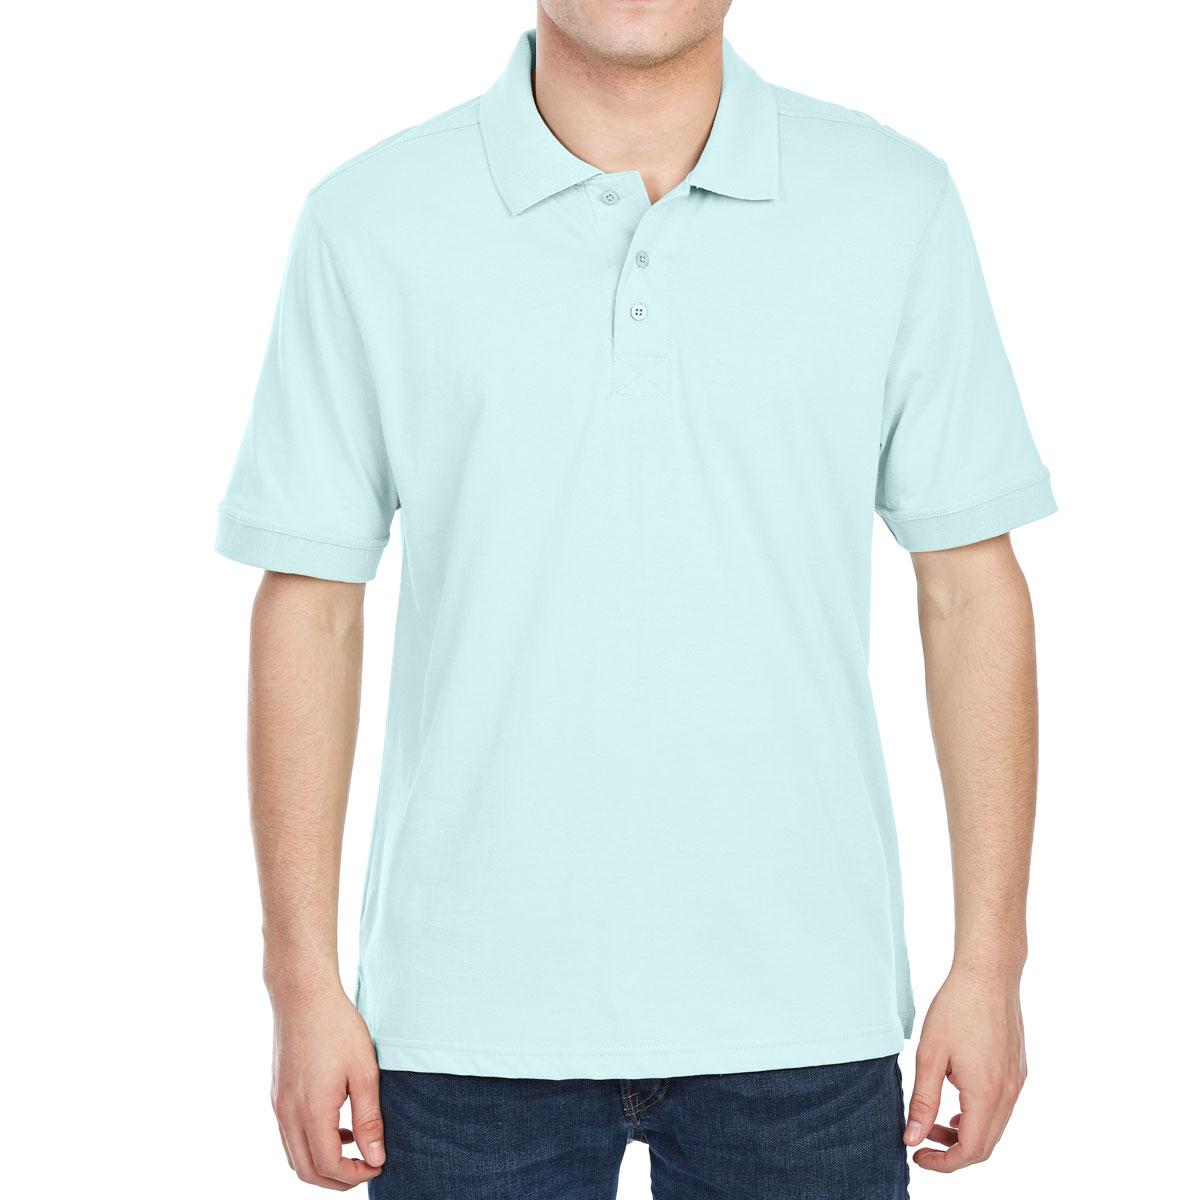 Rugged Trails Men's Jersey Short-Sleeve Polo Shirt - Blue, L